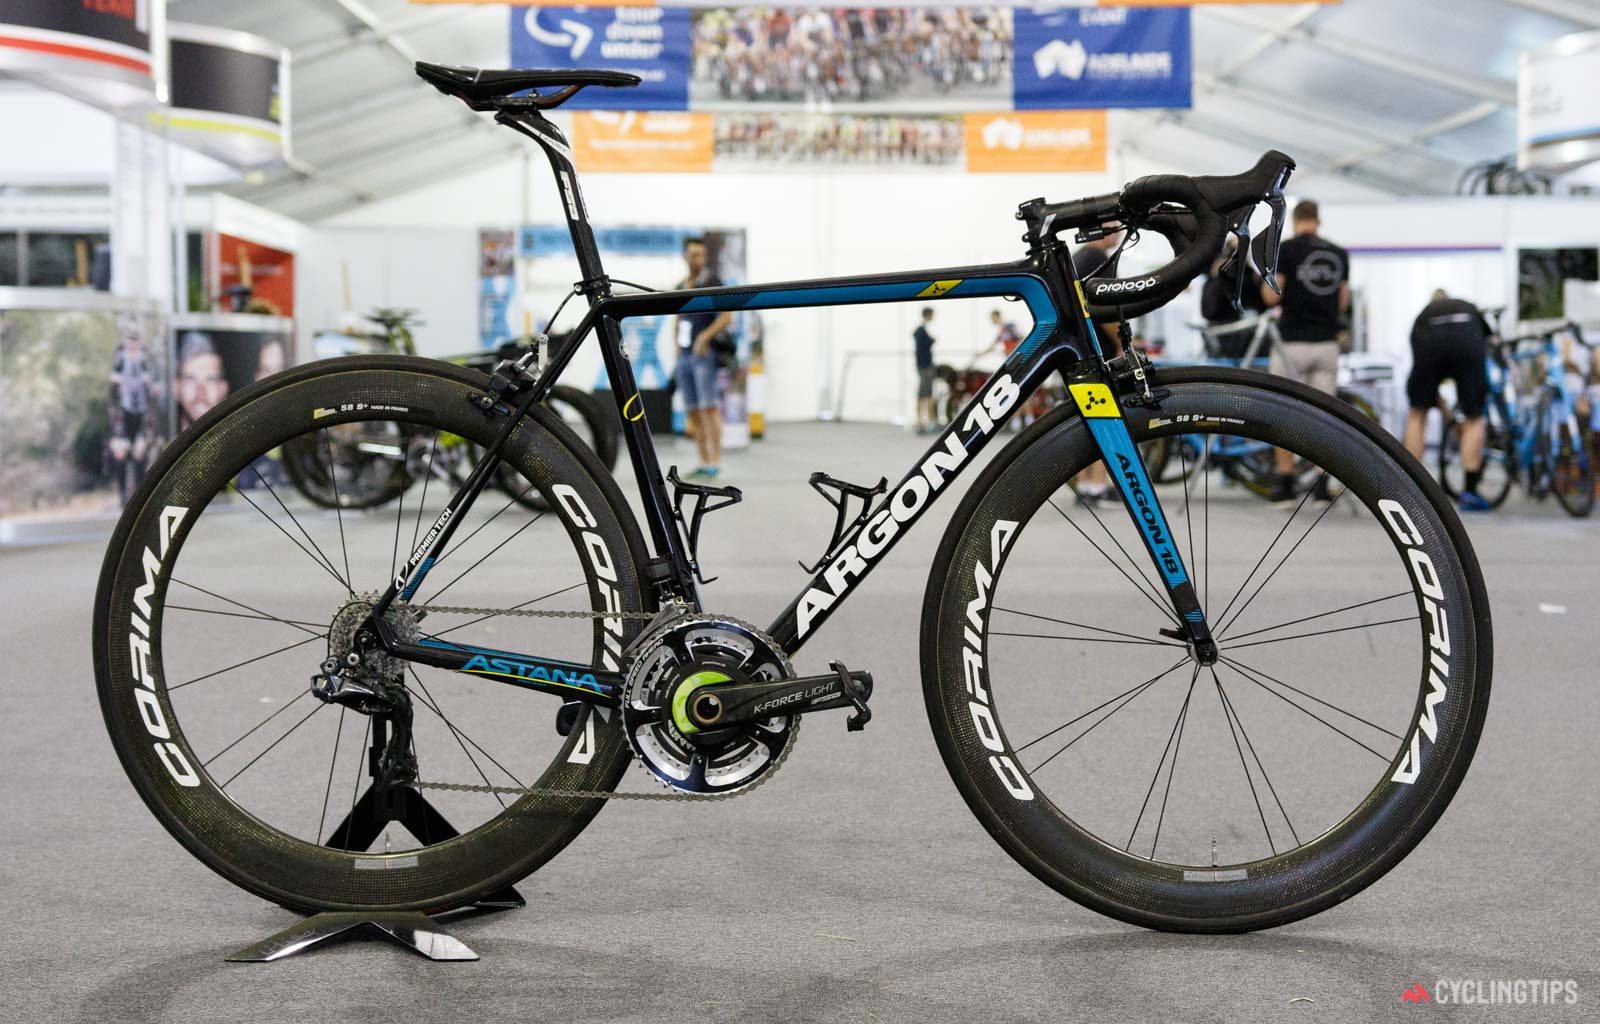 2018-Astana-Argon-18-Gallium-Pro-Team-Bike-Luis-Leon-Sanchez-1.